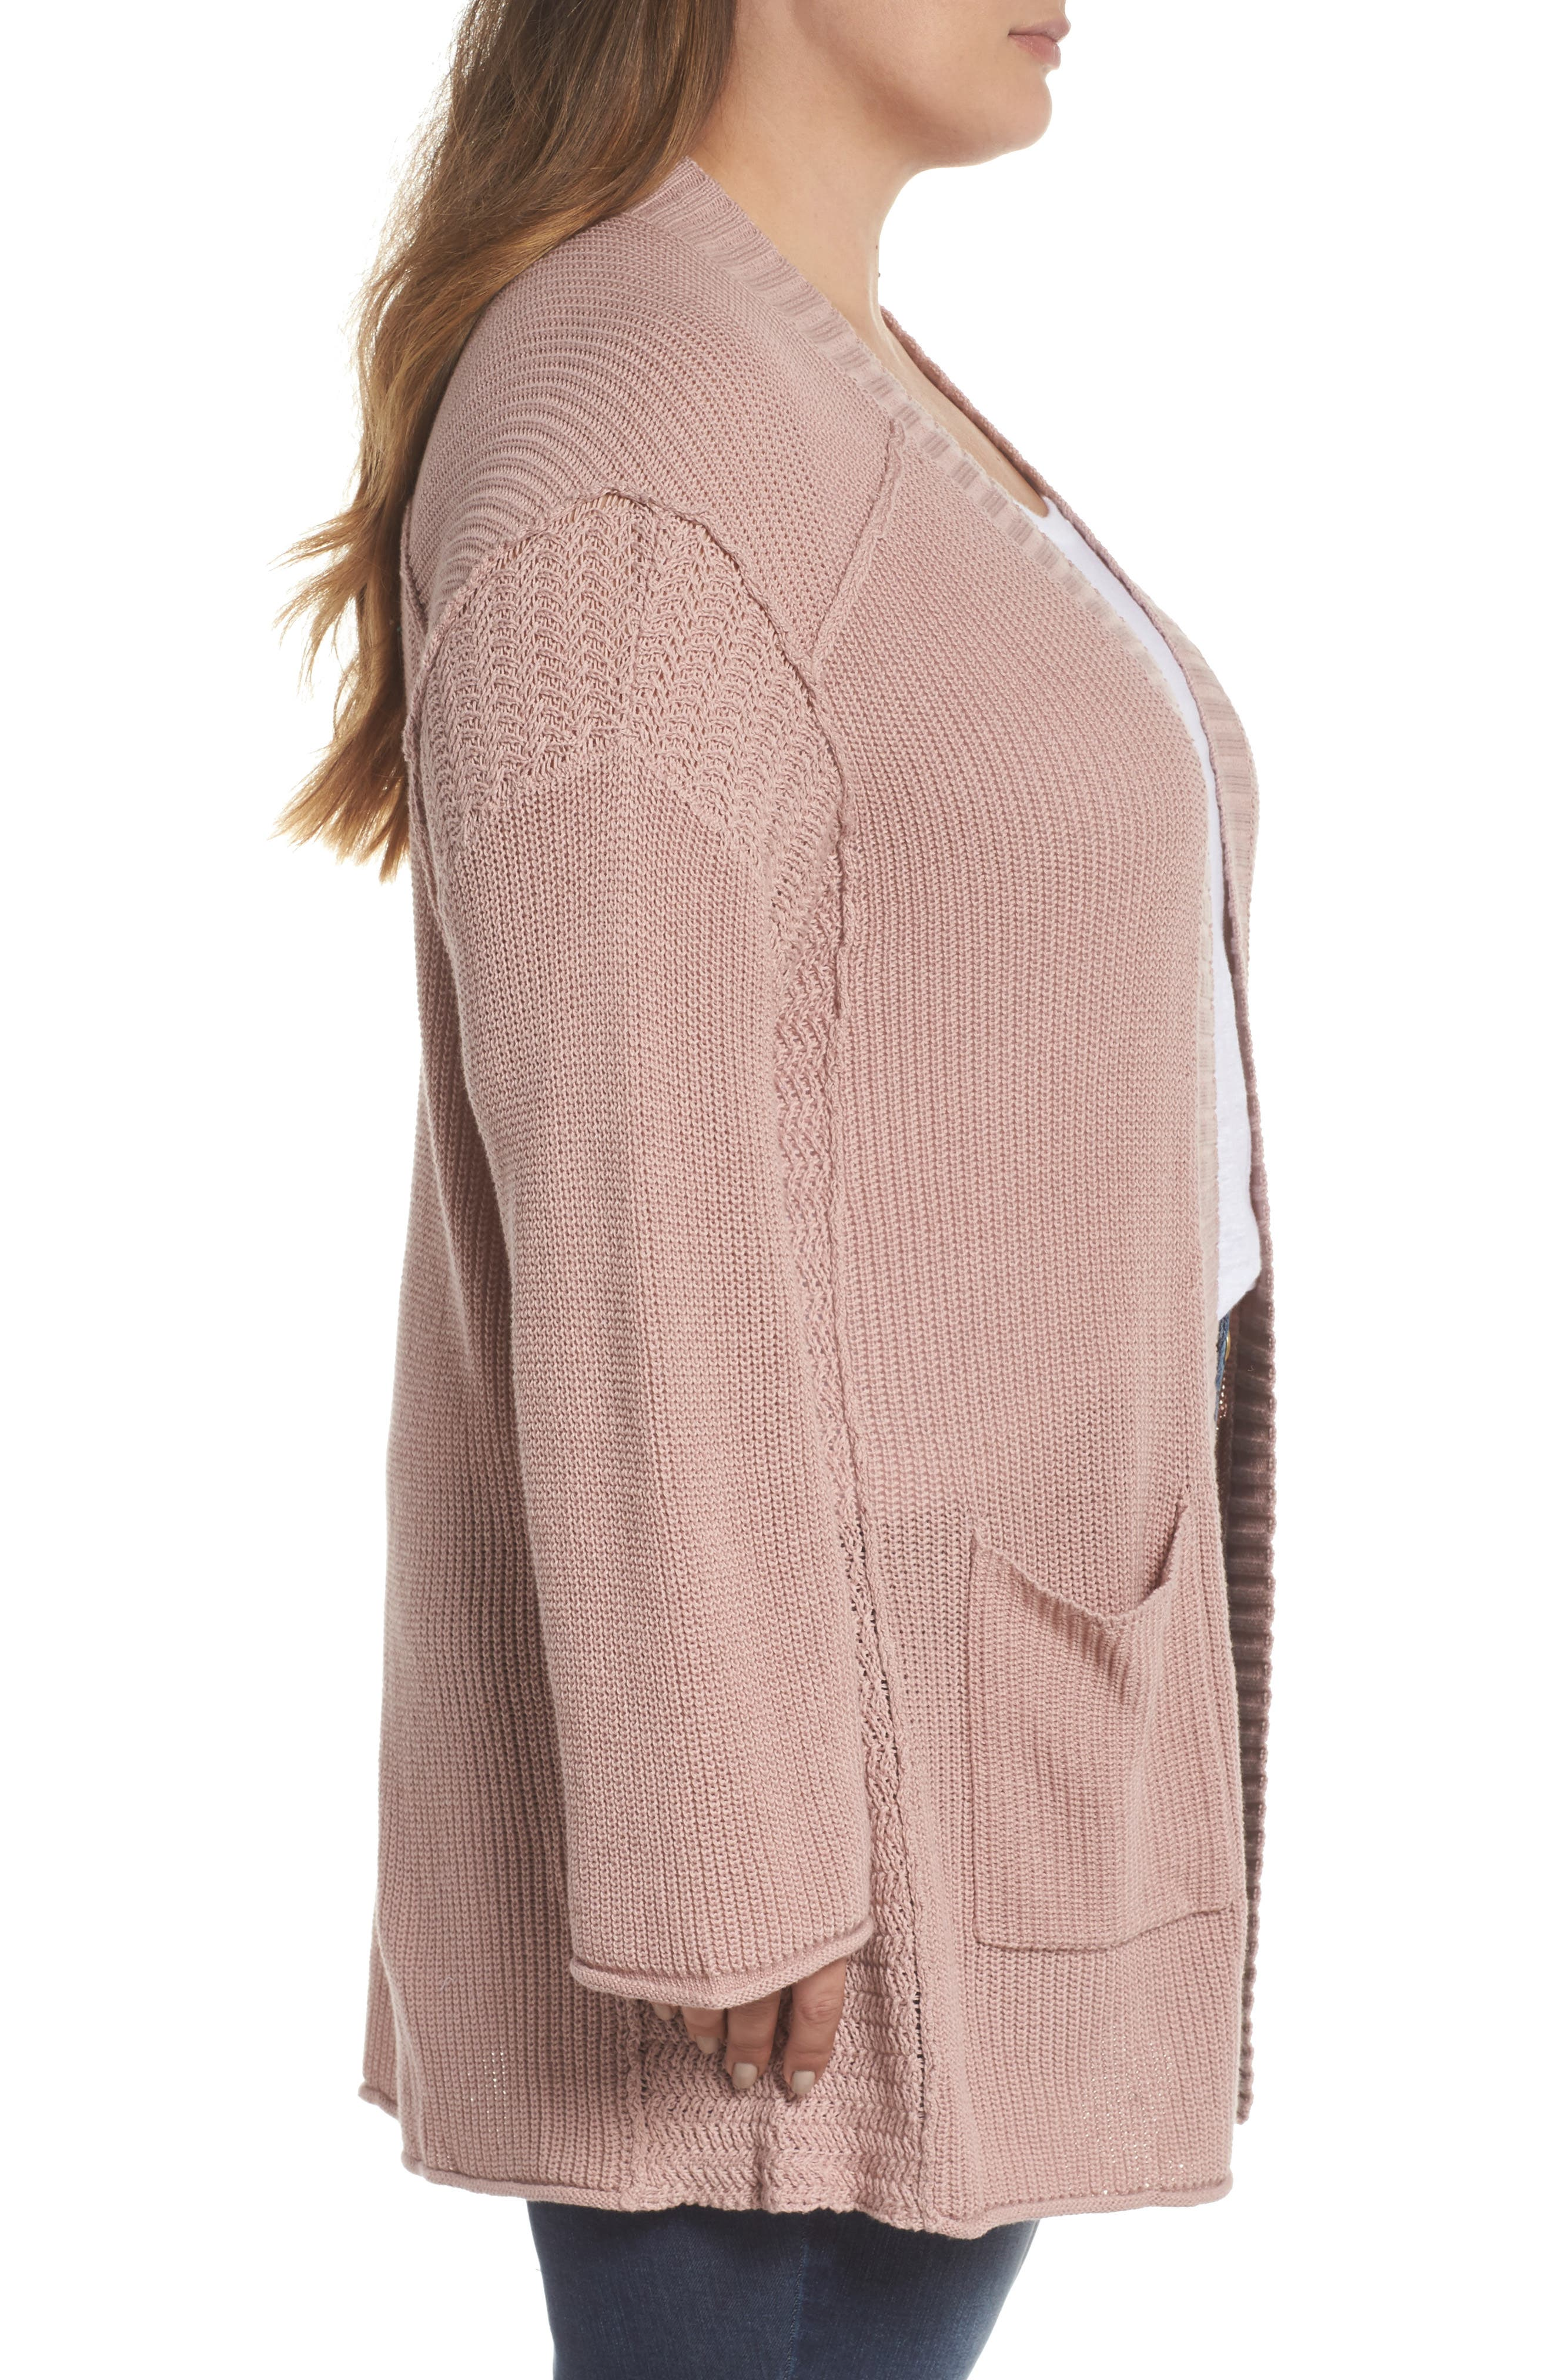 Sweater Knit Cardigan,                             Alternate thumbnail 3, color,                             Pink Adobe